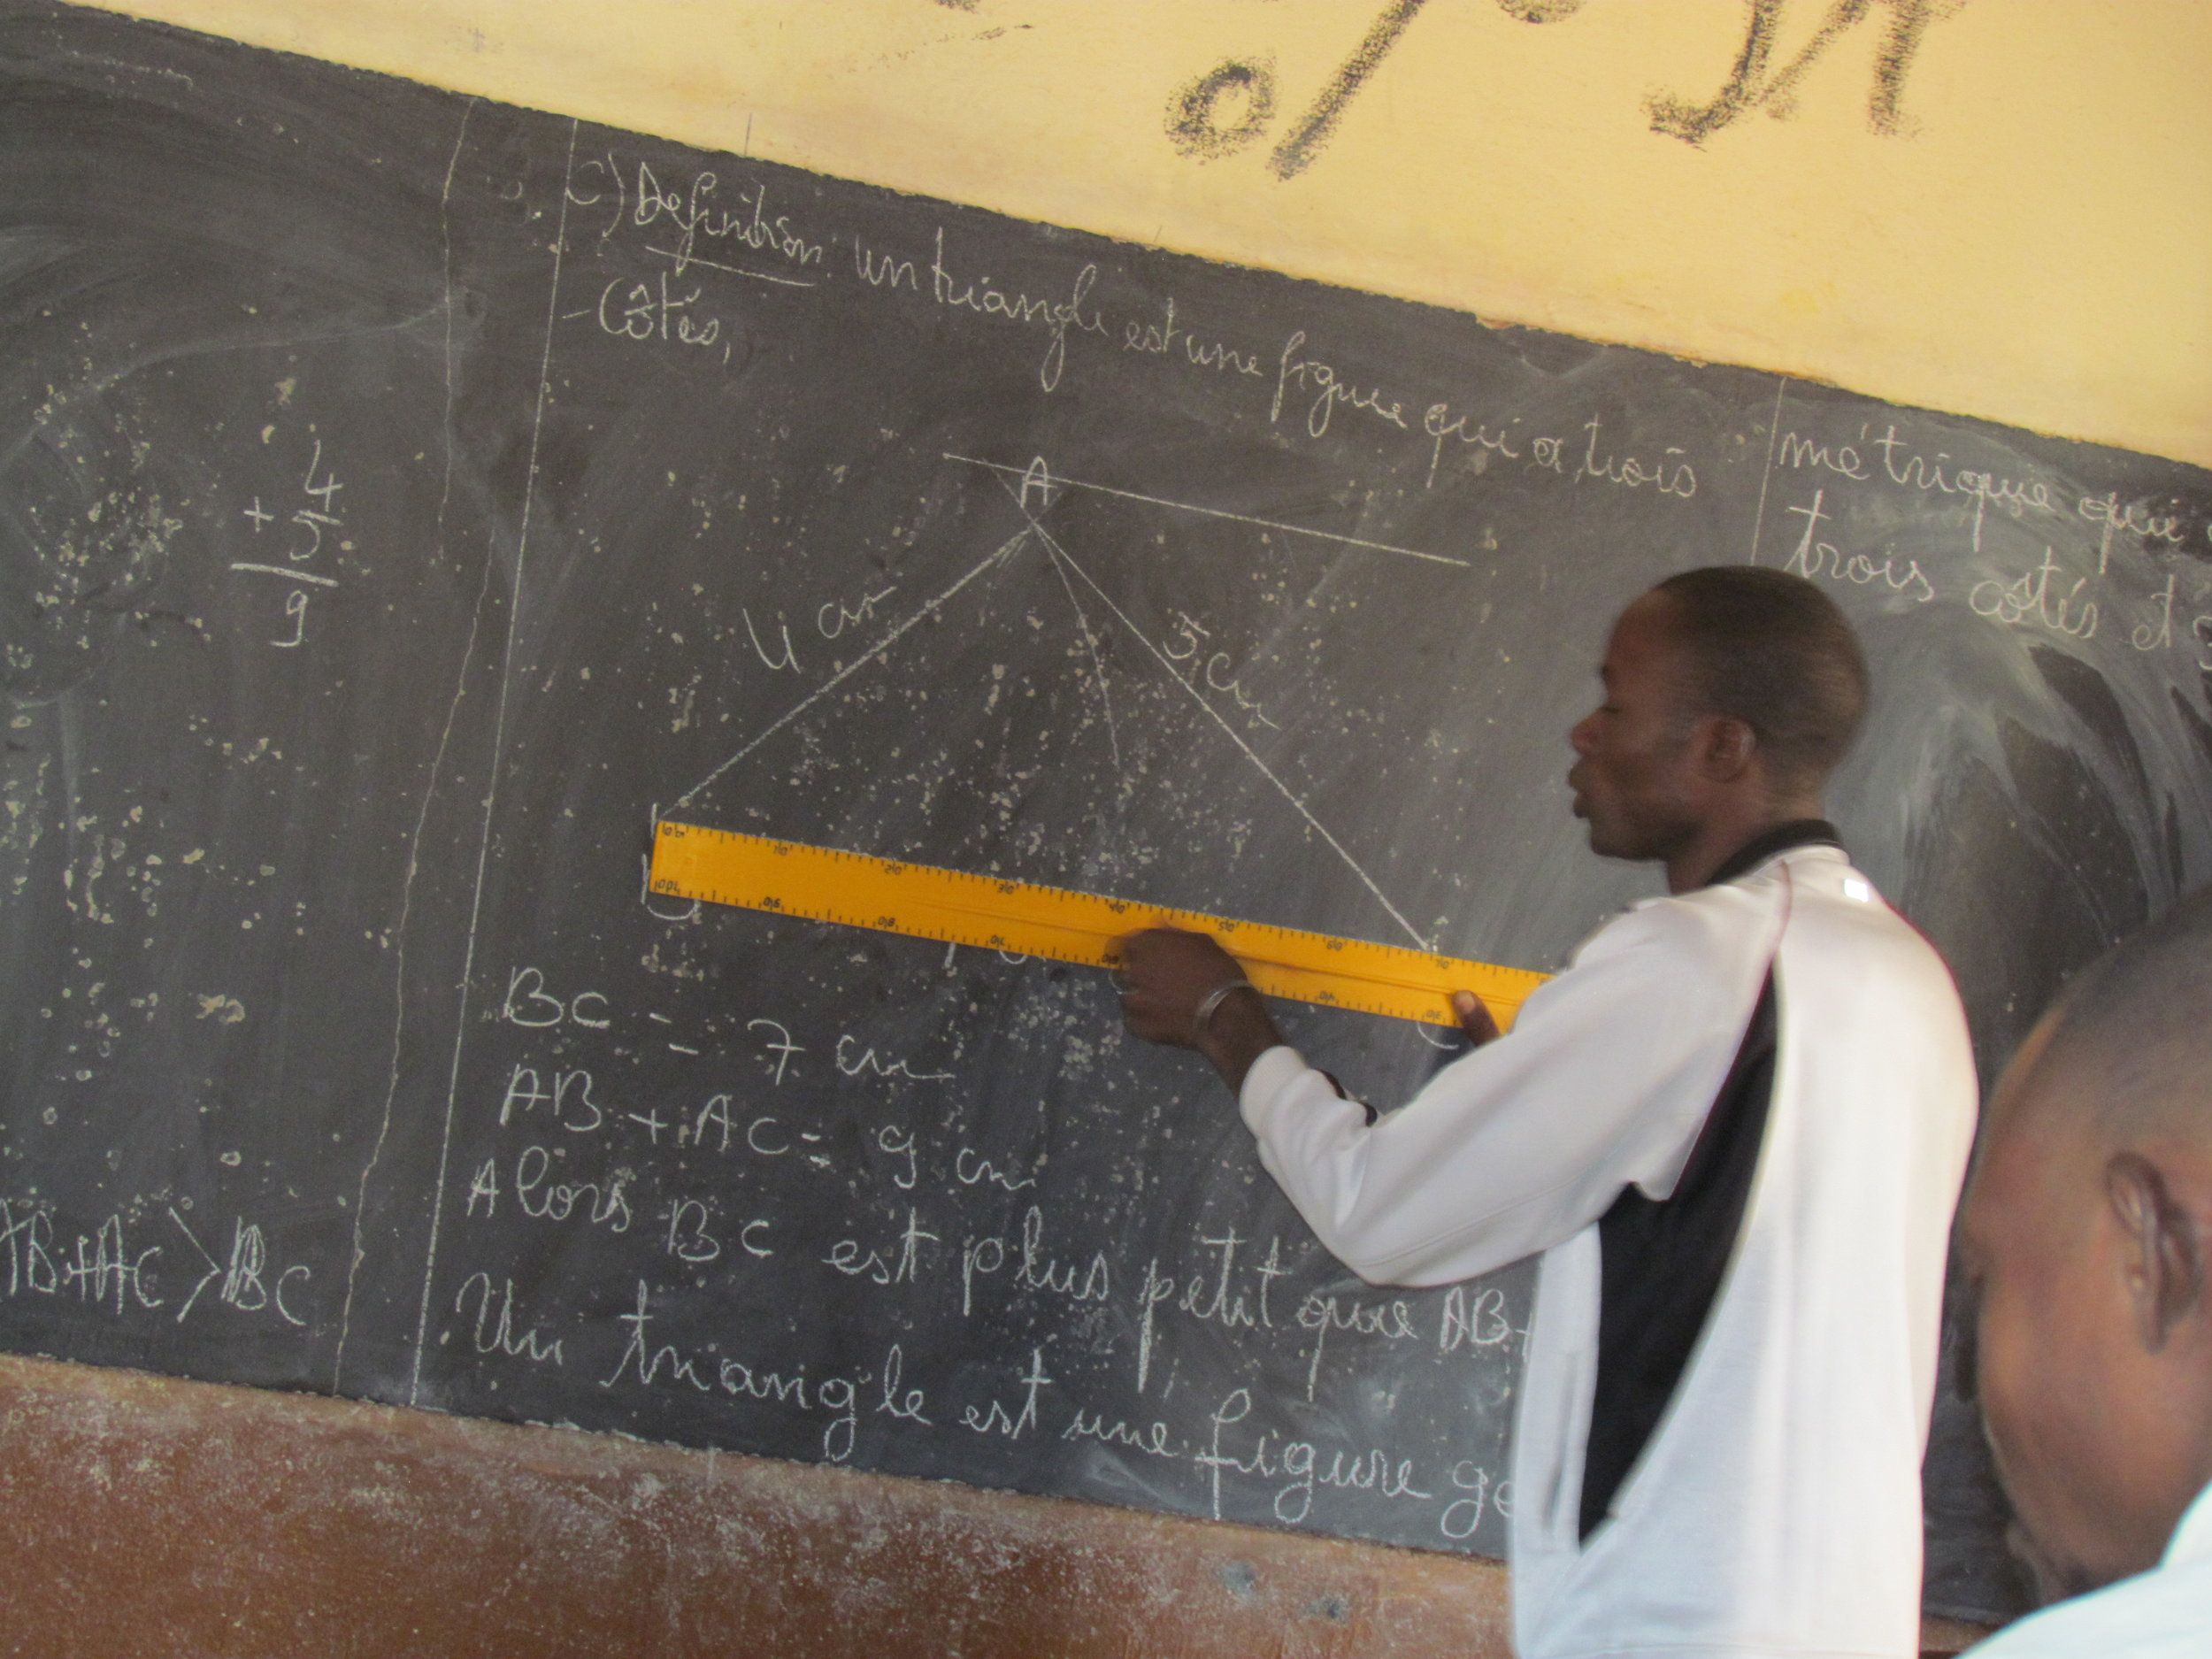 Sequessona math teacher teacher giving a geometry lesson during the teacher peer meeting.